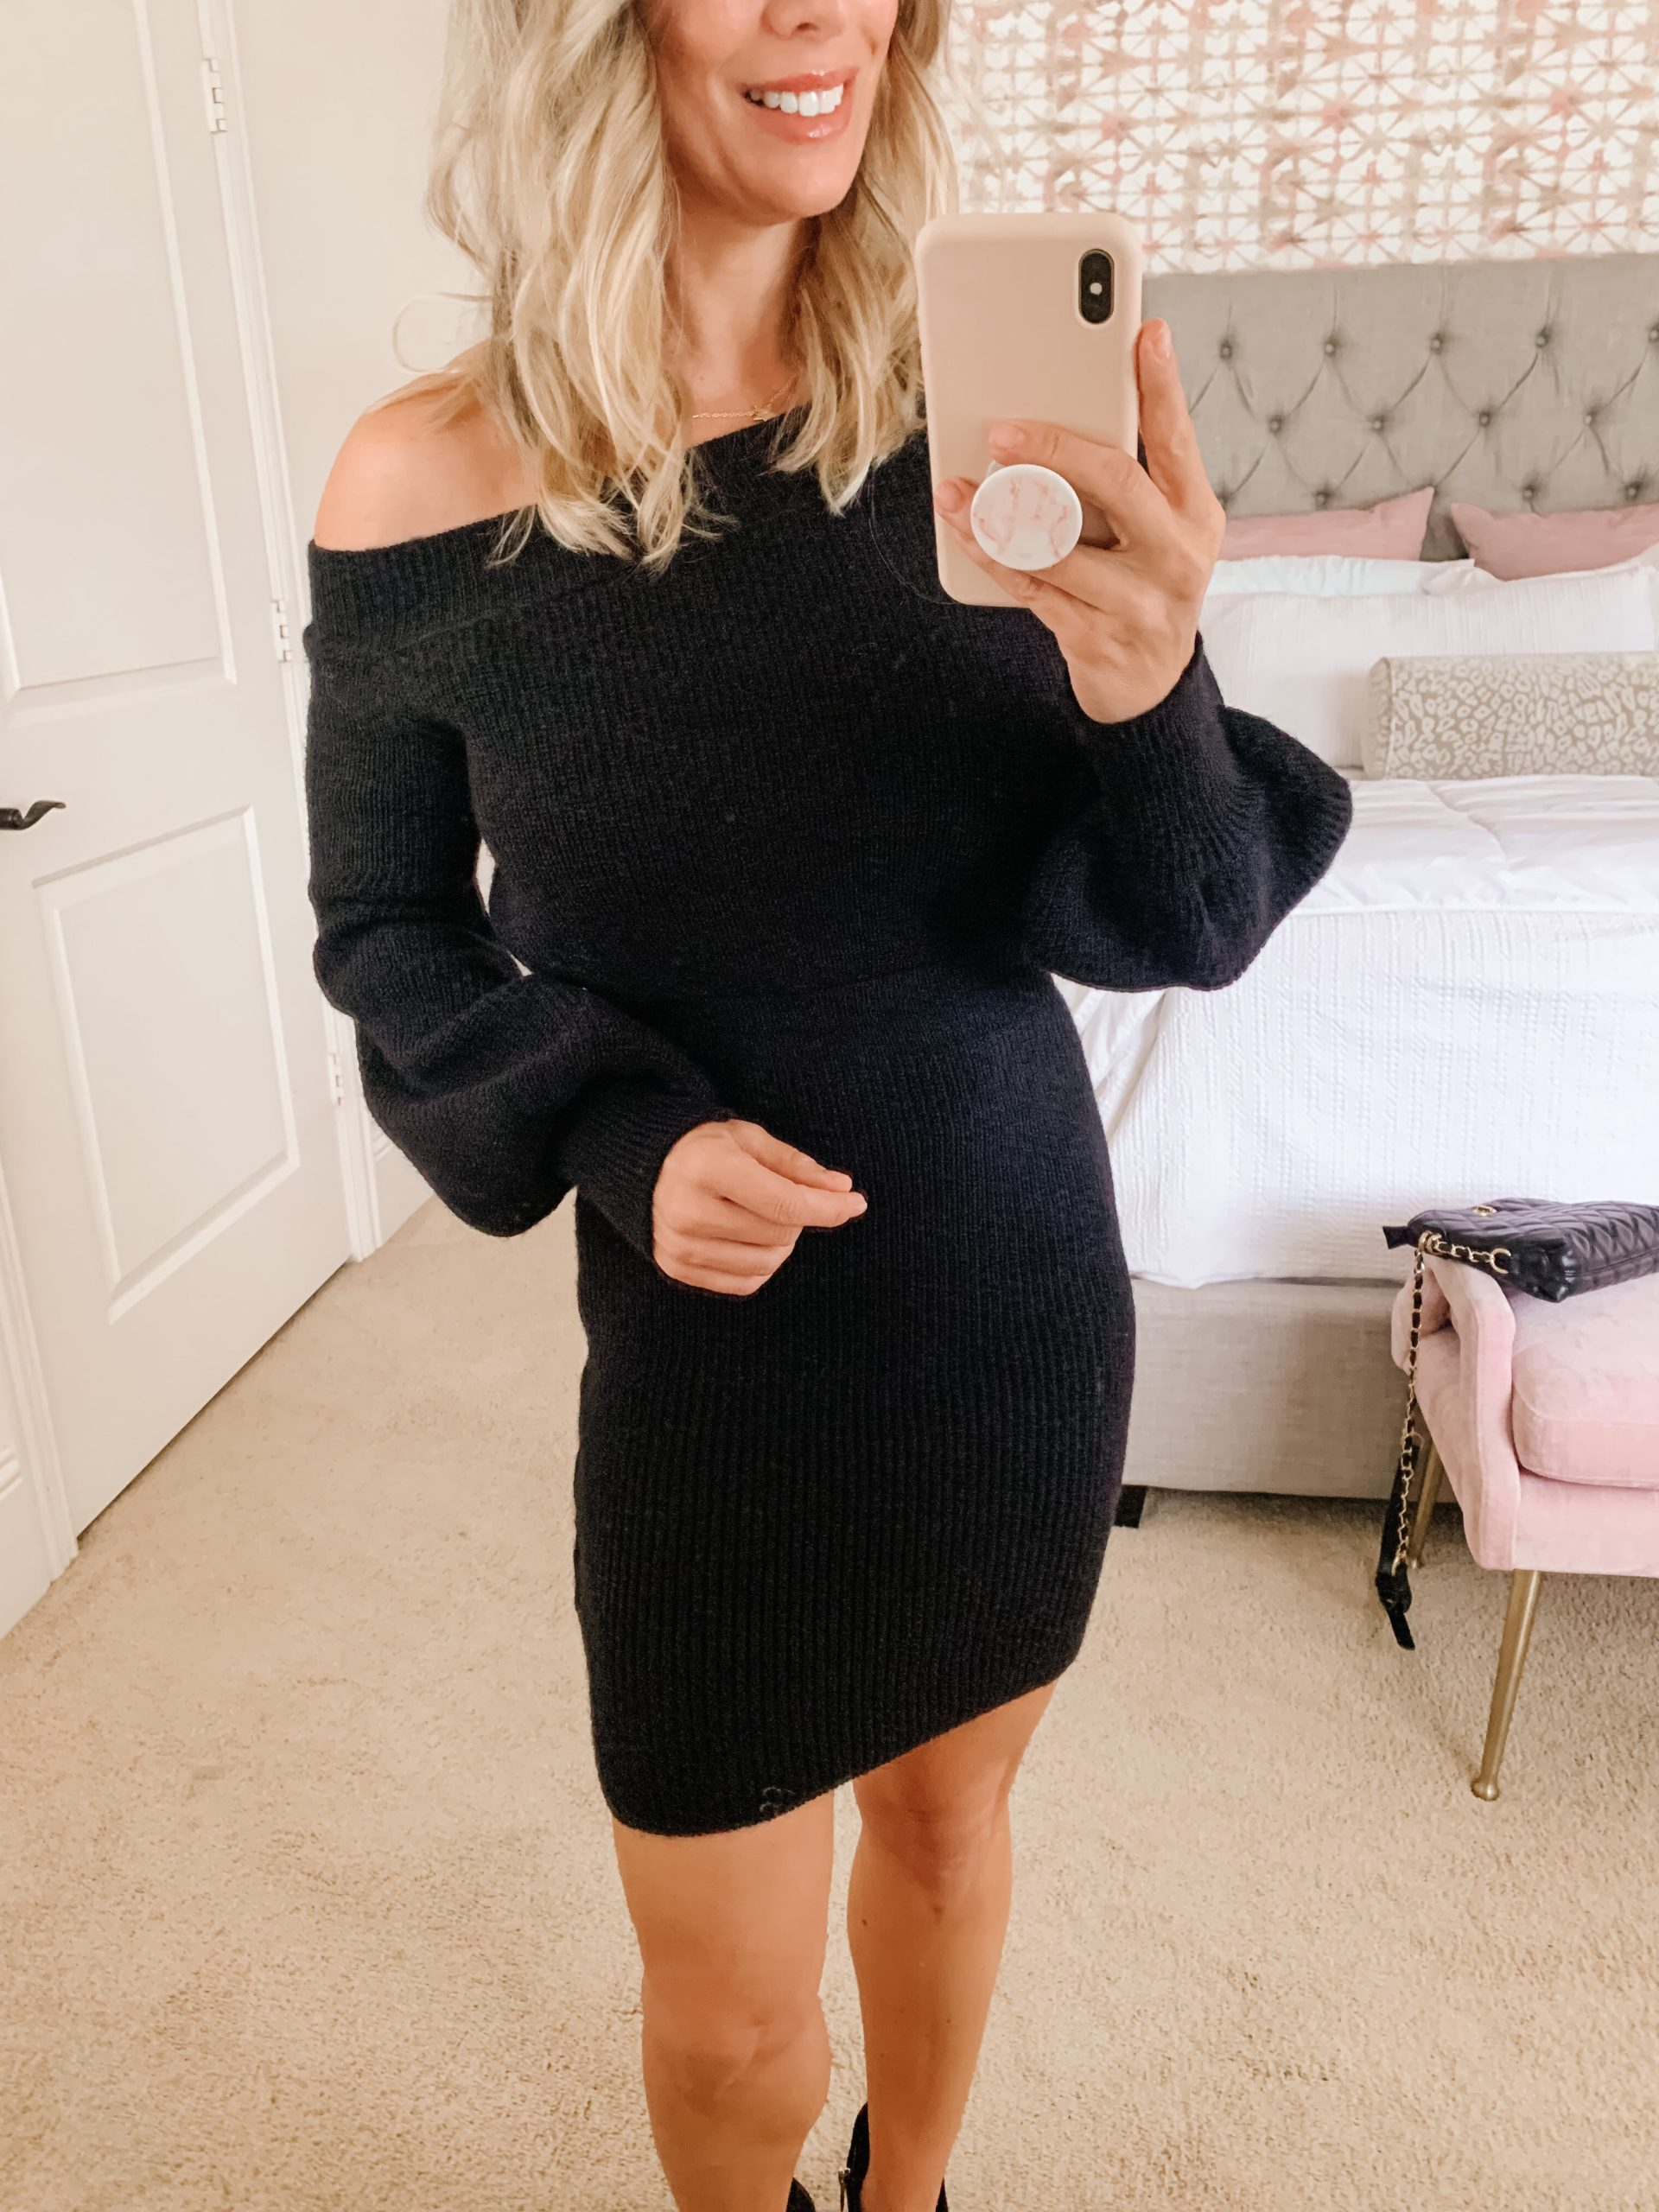 Sweater dress, Booties, Crossbody